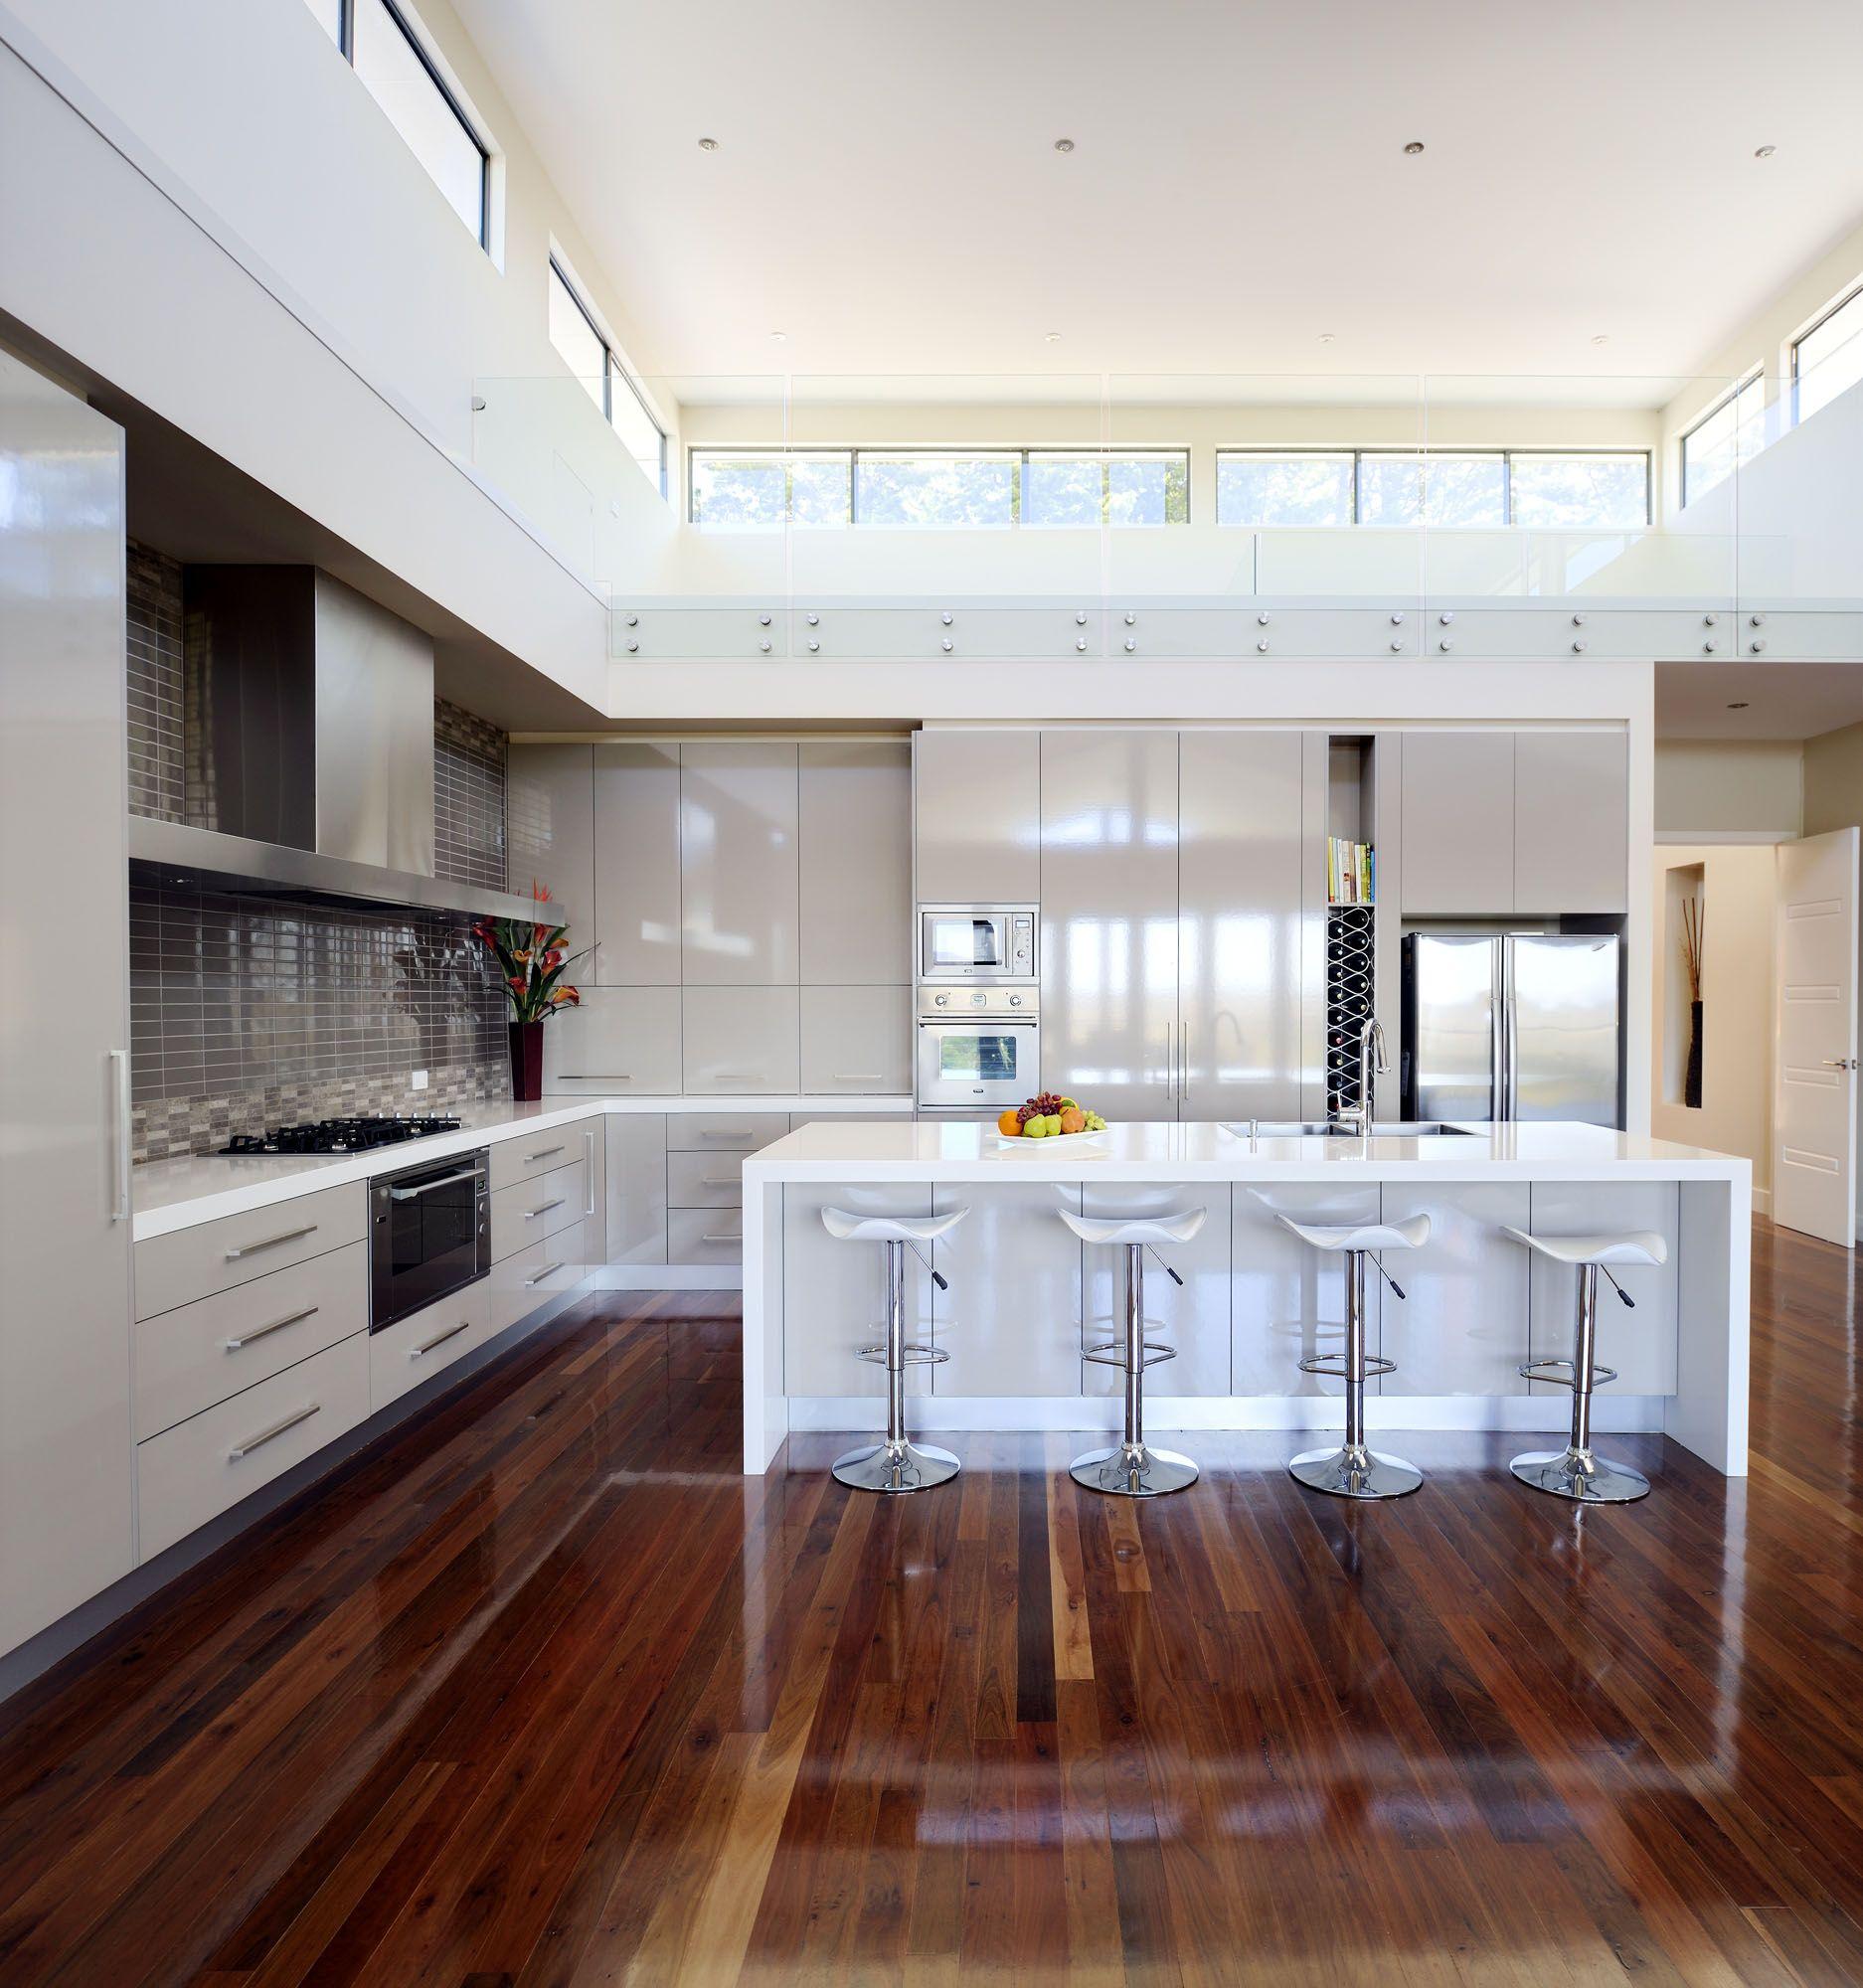 Urban Kitchens Australia in Caesarstone 2141 Snow Sleek